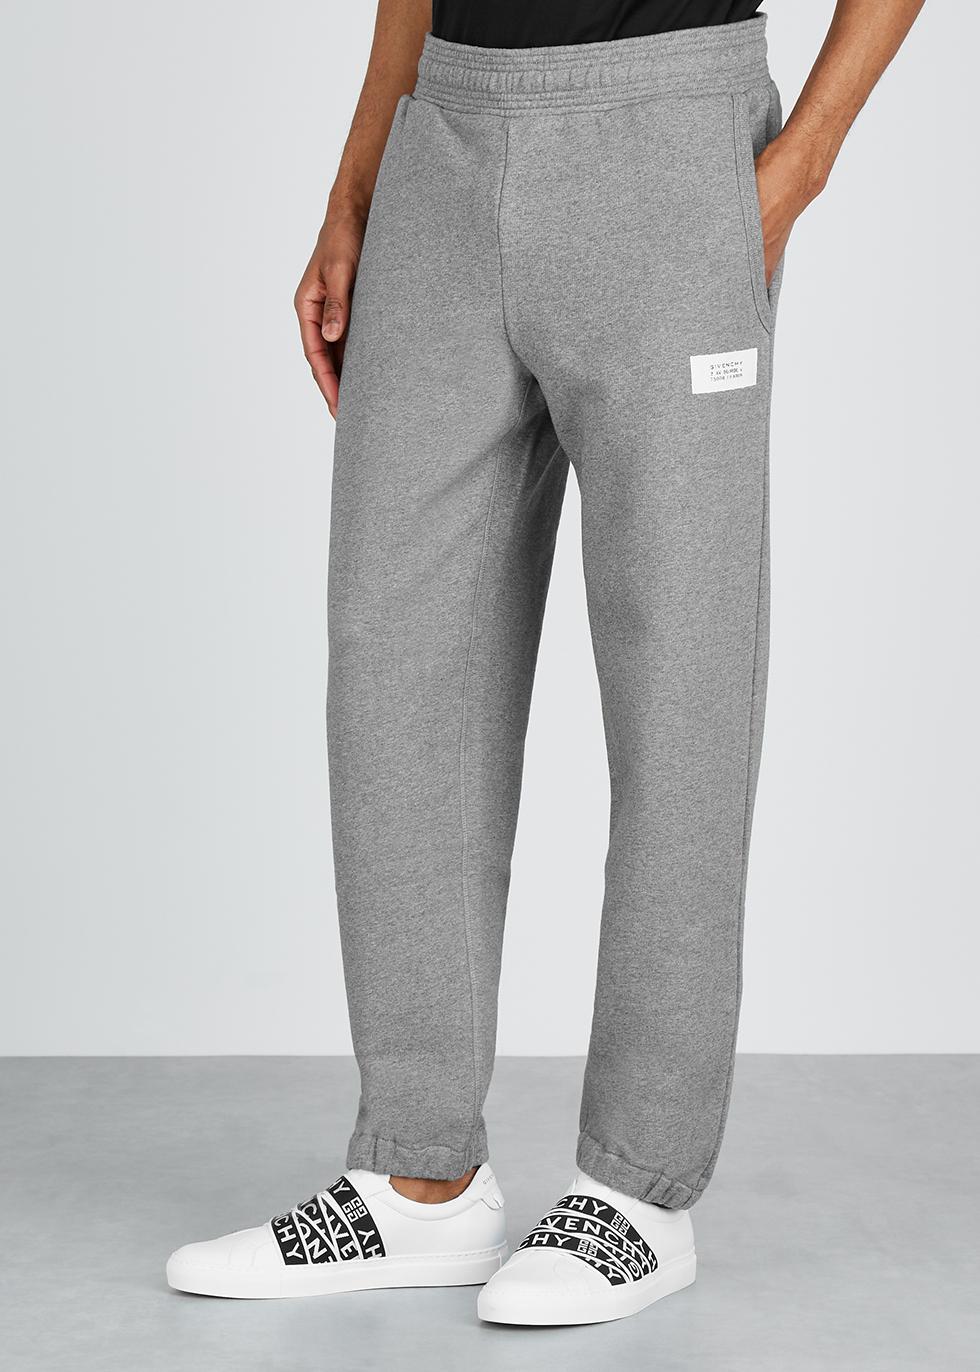 Grey cotton sweatpants - Givenchy